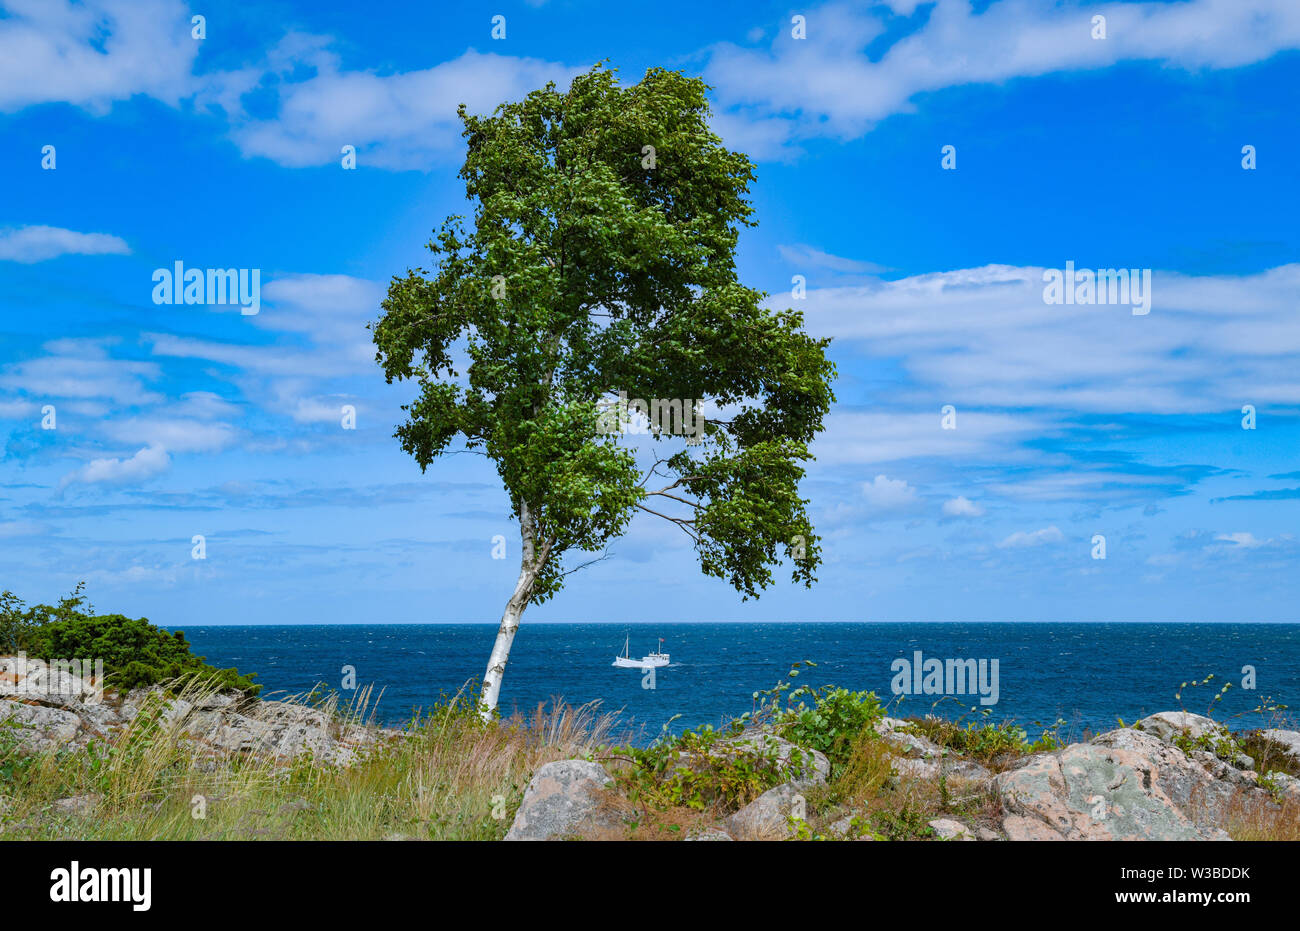 02 July 2019, Denmark, Gudhjem: The north coast of the Danish Baltic Sea island Bornholm near the port of Gudhjem. The island Bornholm is, together with the offshore archipelago Ertholmene, Denmark's most eastern island. Thanks to its location, the island of Bornholm counts many hours of sunshine. Photo: Patrick Pleul/dpa-Zentralbild/ZB Stock Photo